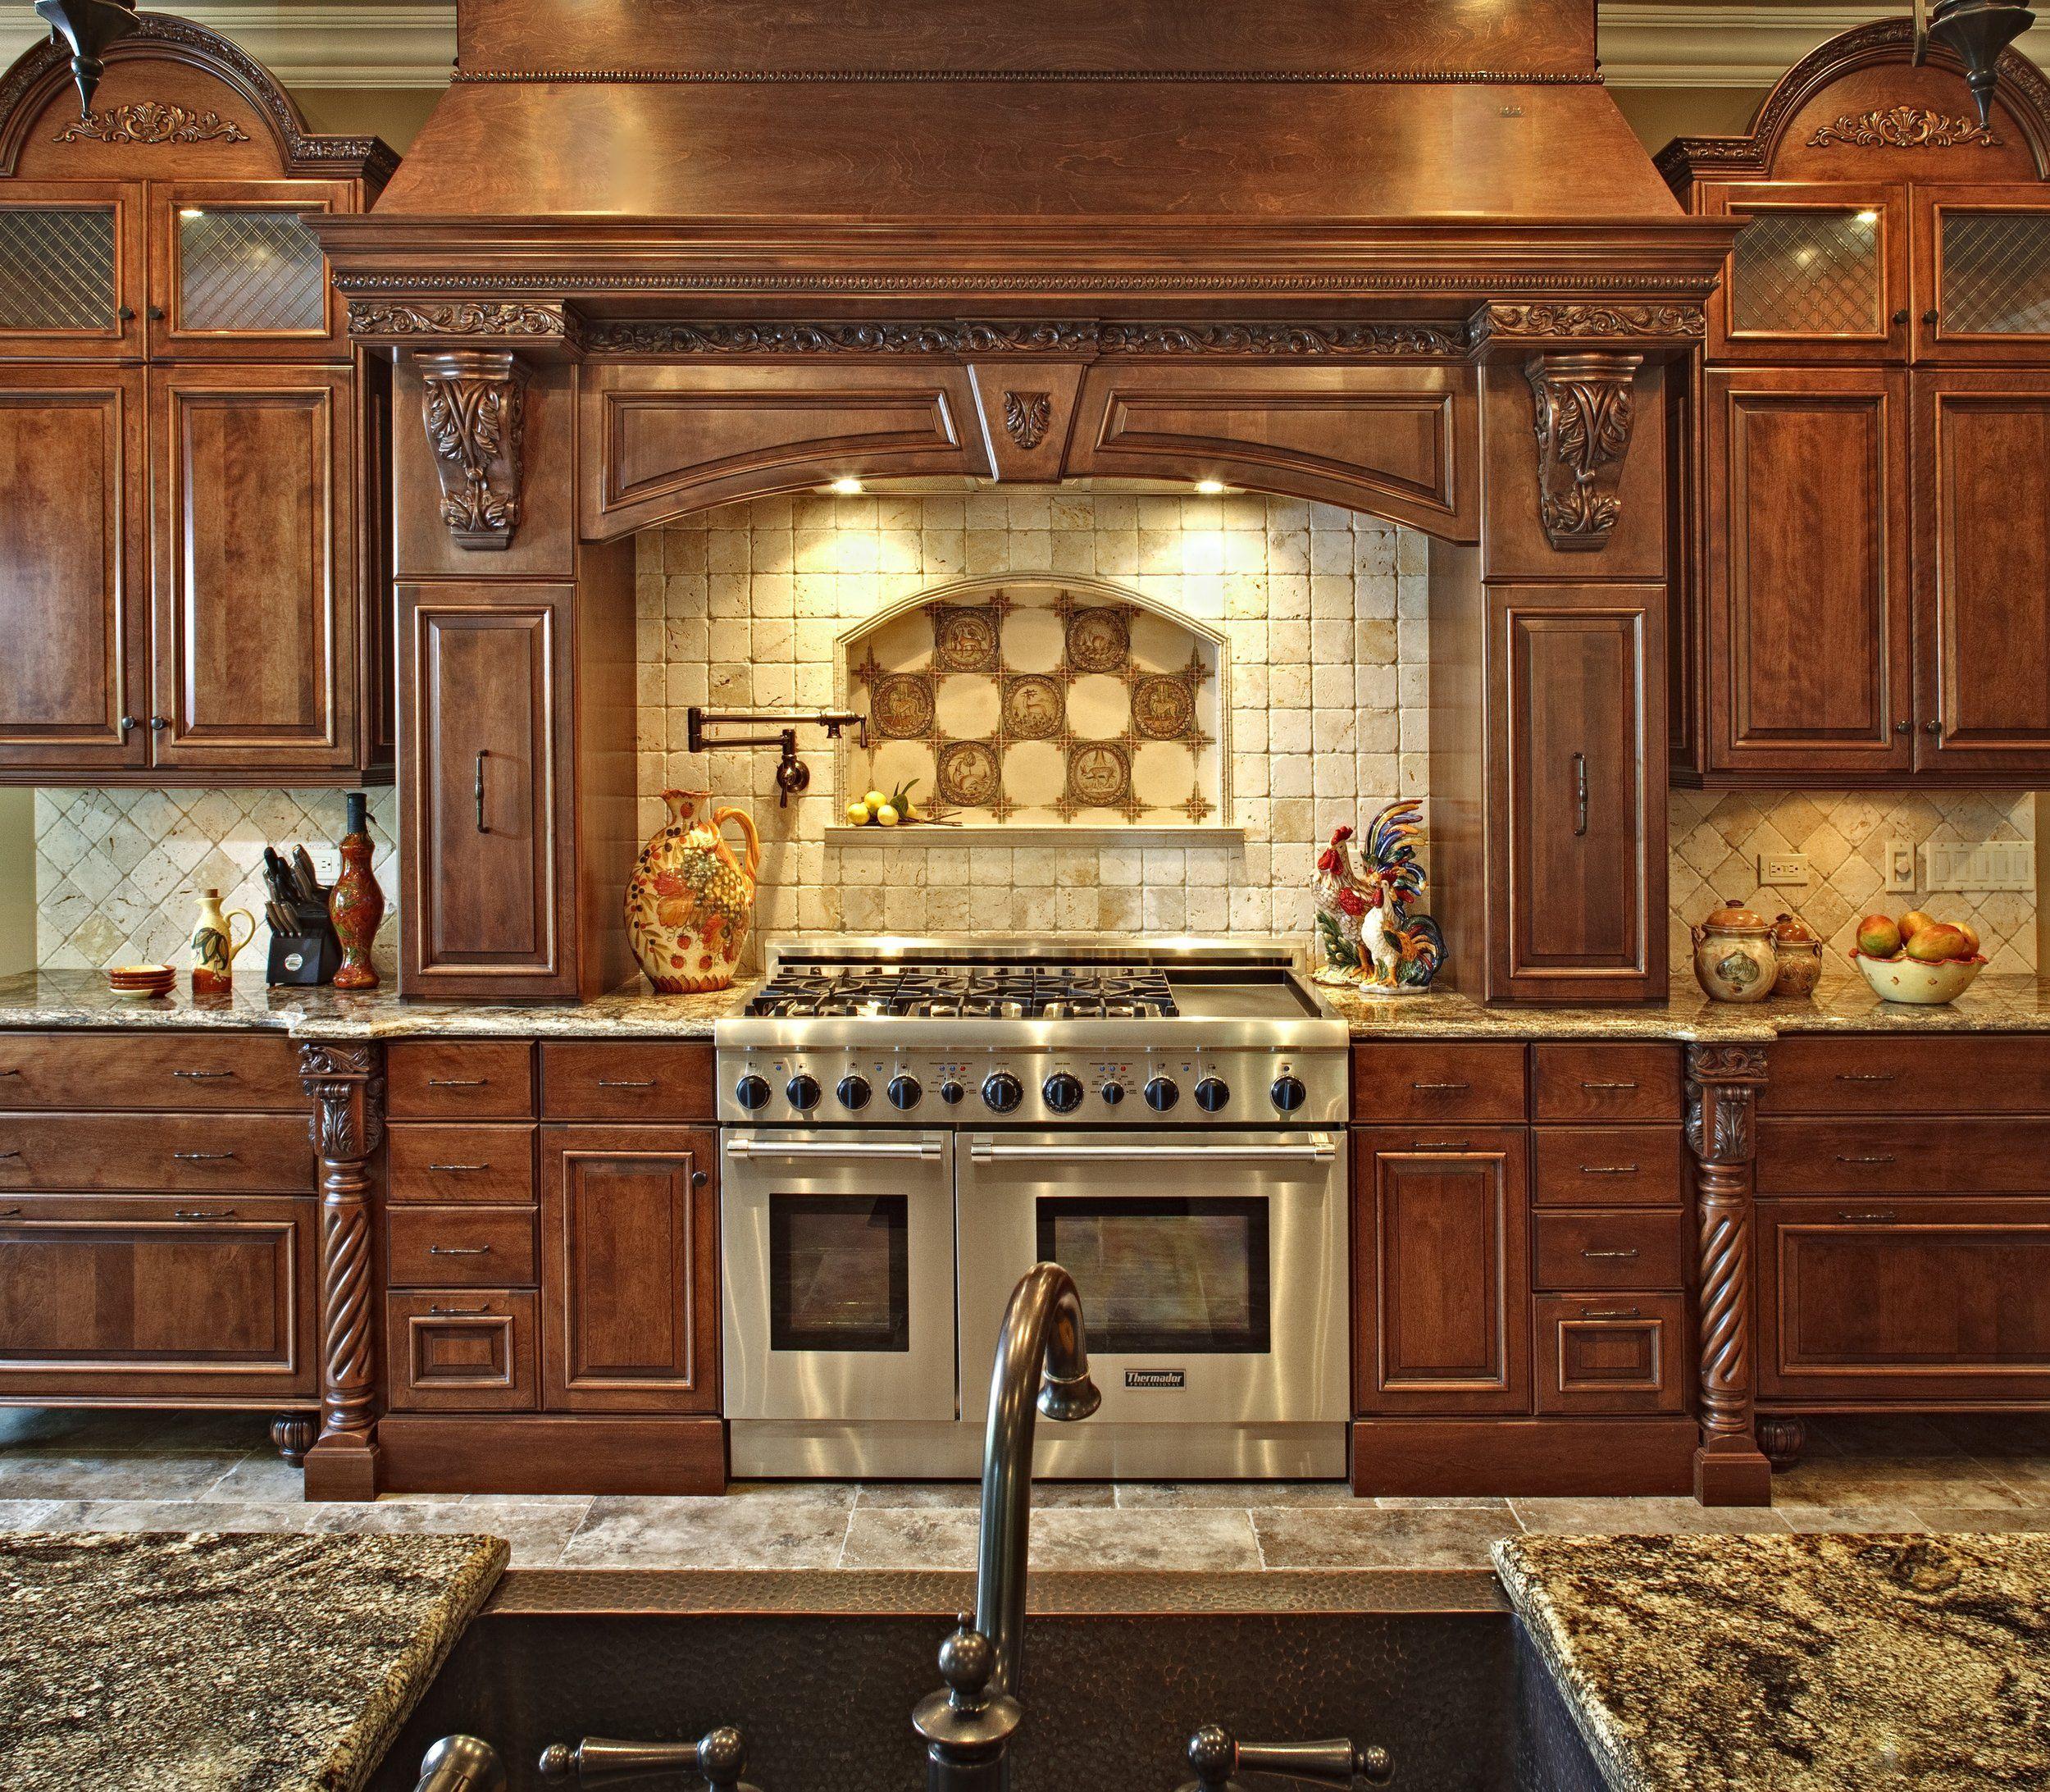 Custom Hand Carved Kitchen Hoodhand Carved Kitchen Hood Affordable Kitchen Remodeling Tuscan Kitchen Luxury Kitchen Design